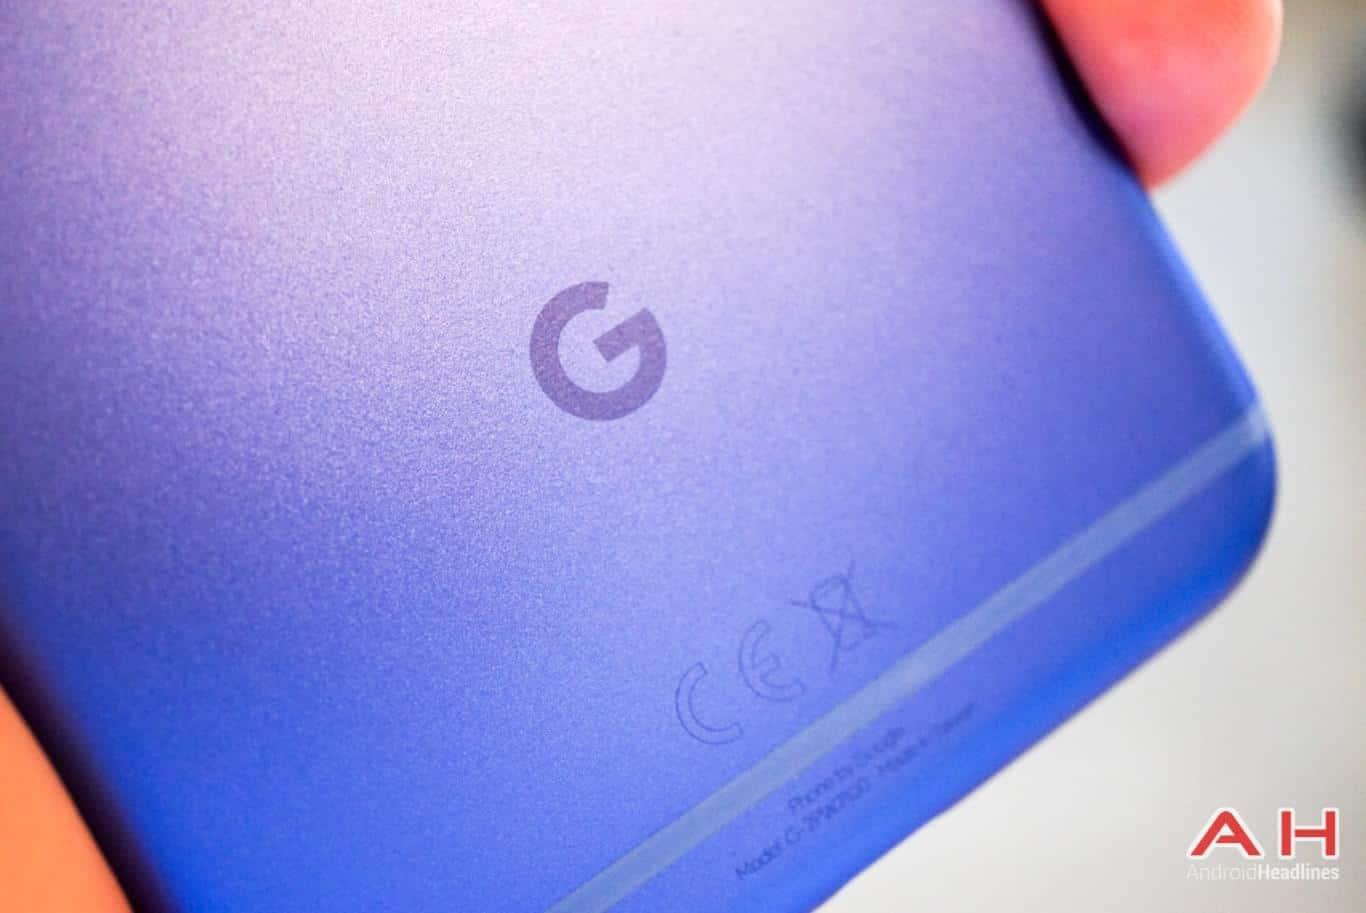 Google Pixel XL Hands On AH 18